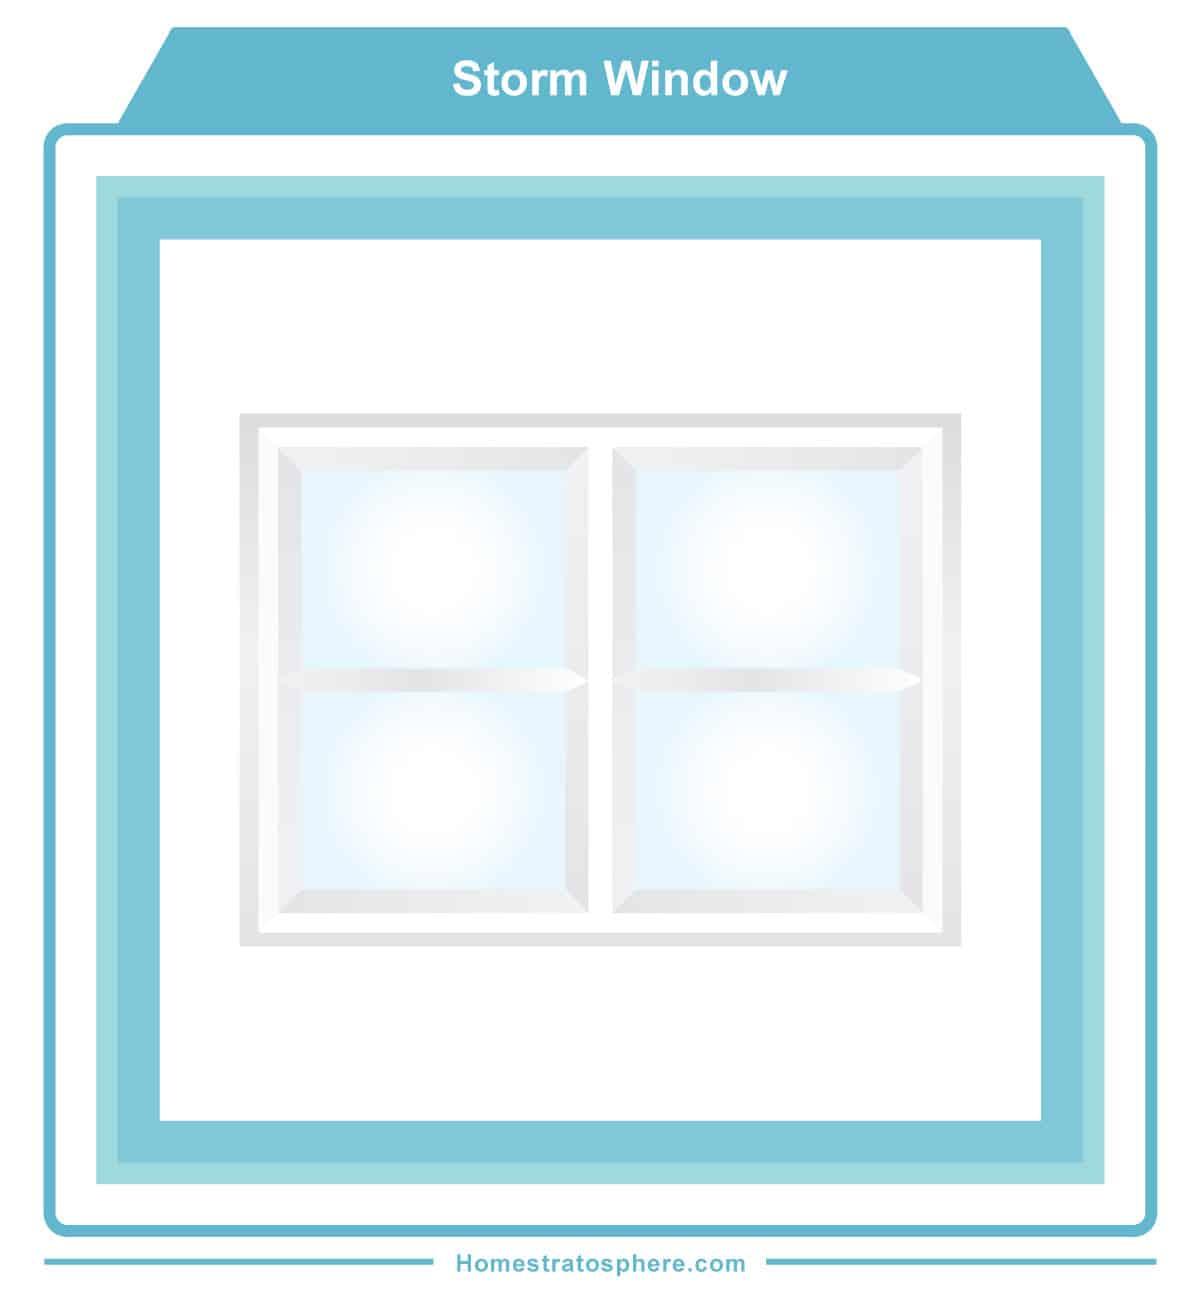 Storm Window diagram